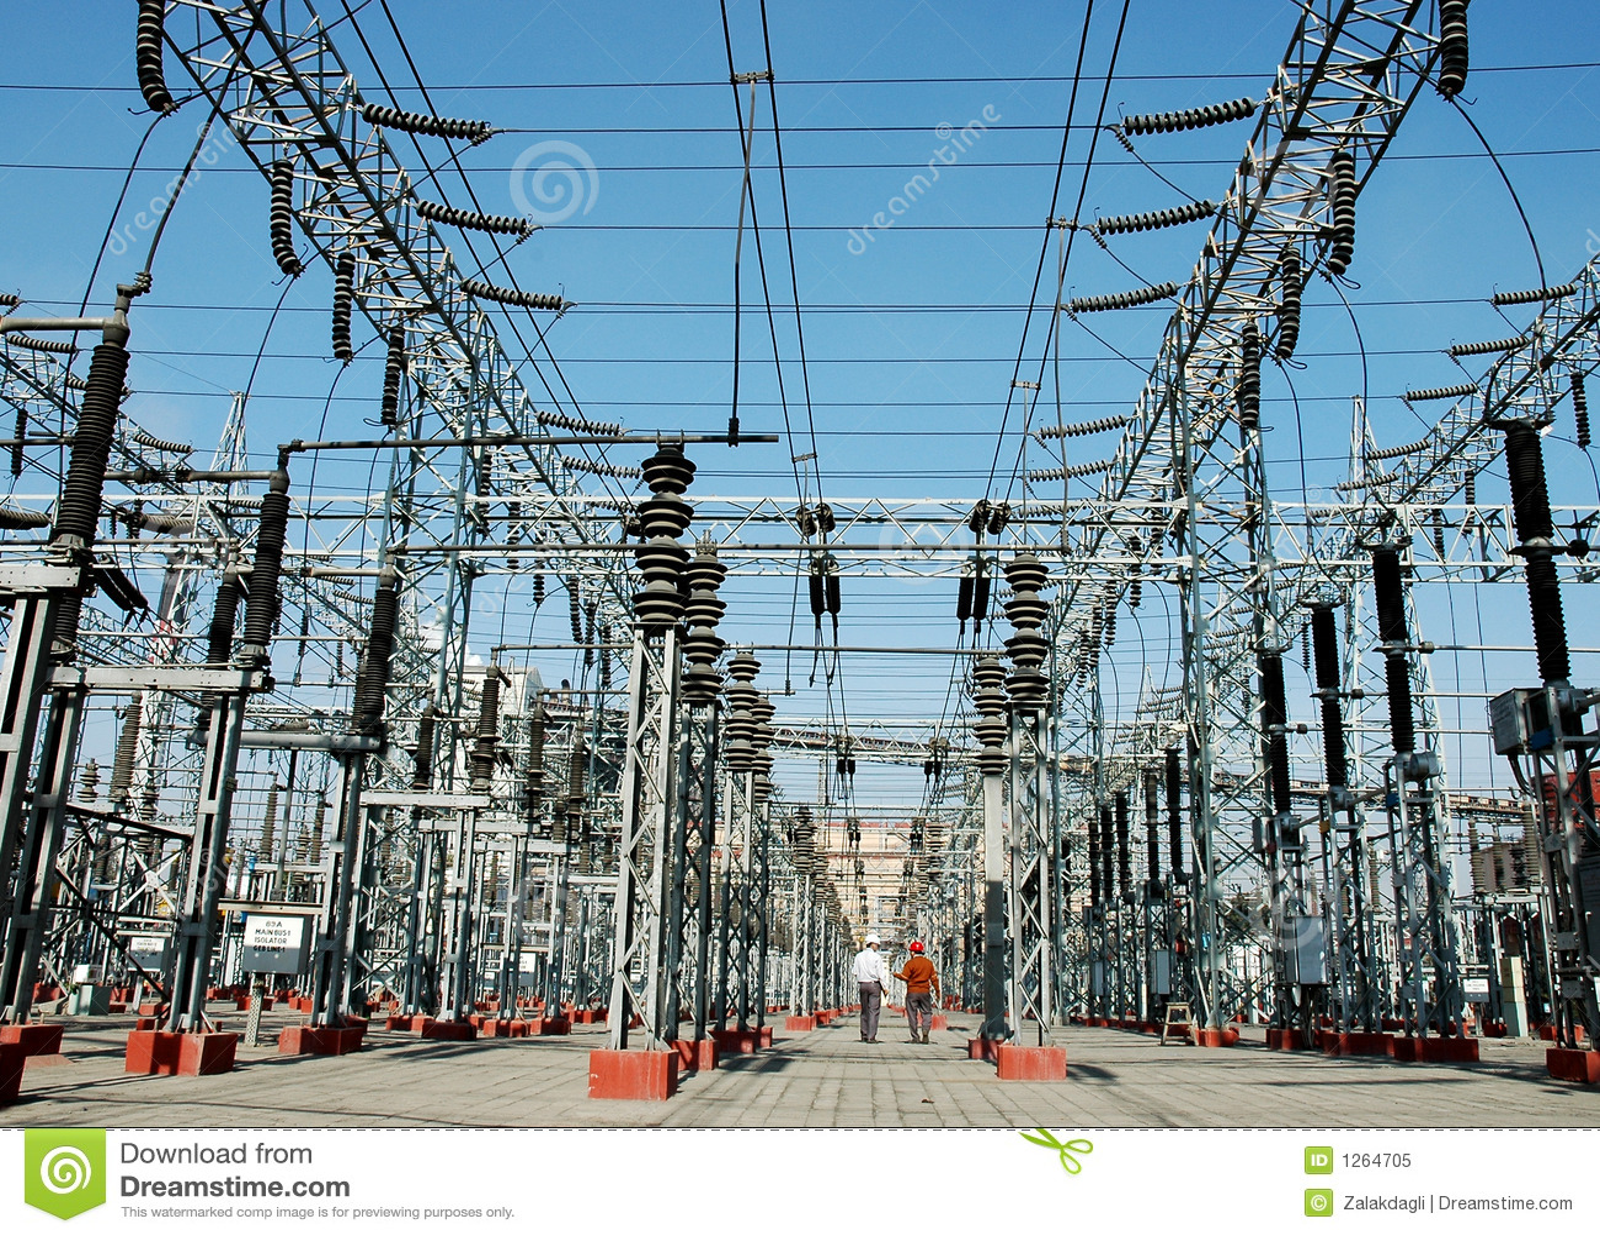 Elektriciteit, de industrie, technologie, macht, power-line